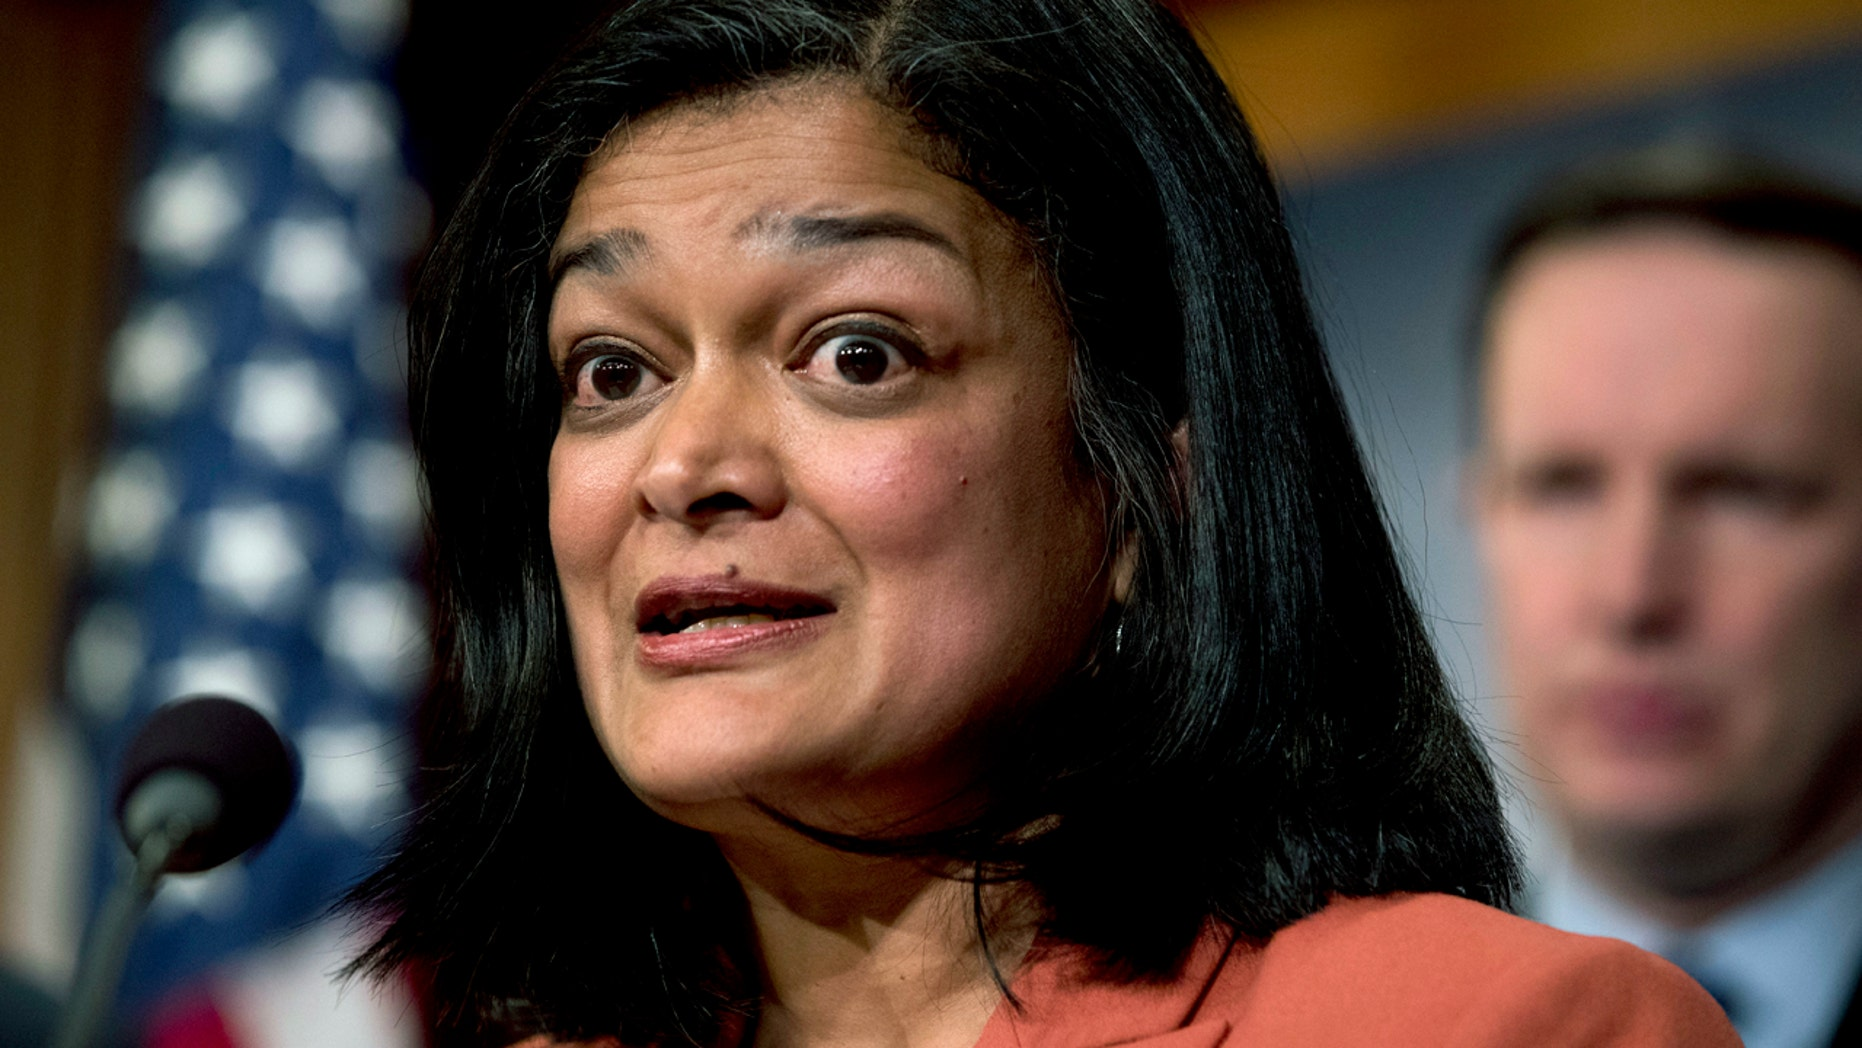 Congressional Progressive Caucus co-chairwoman Rep. Pramila Jayapal, D-Wash, offered an amendment to the spending measure. (AP Photo/Andrew Harnik, File)